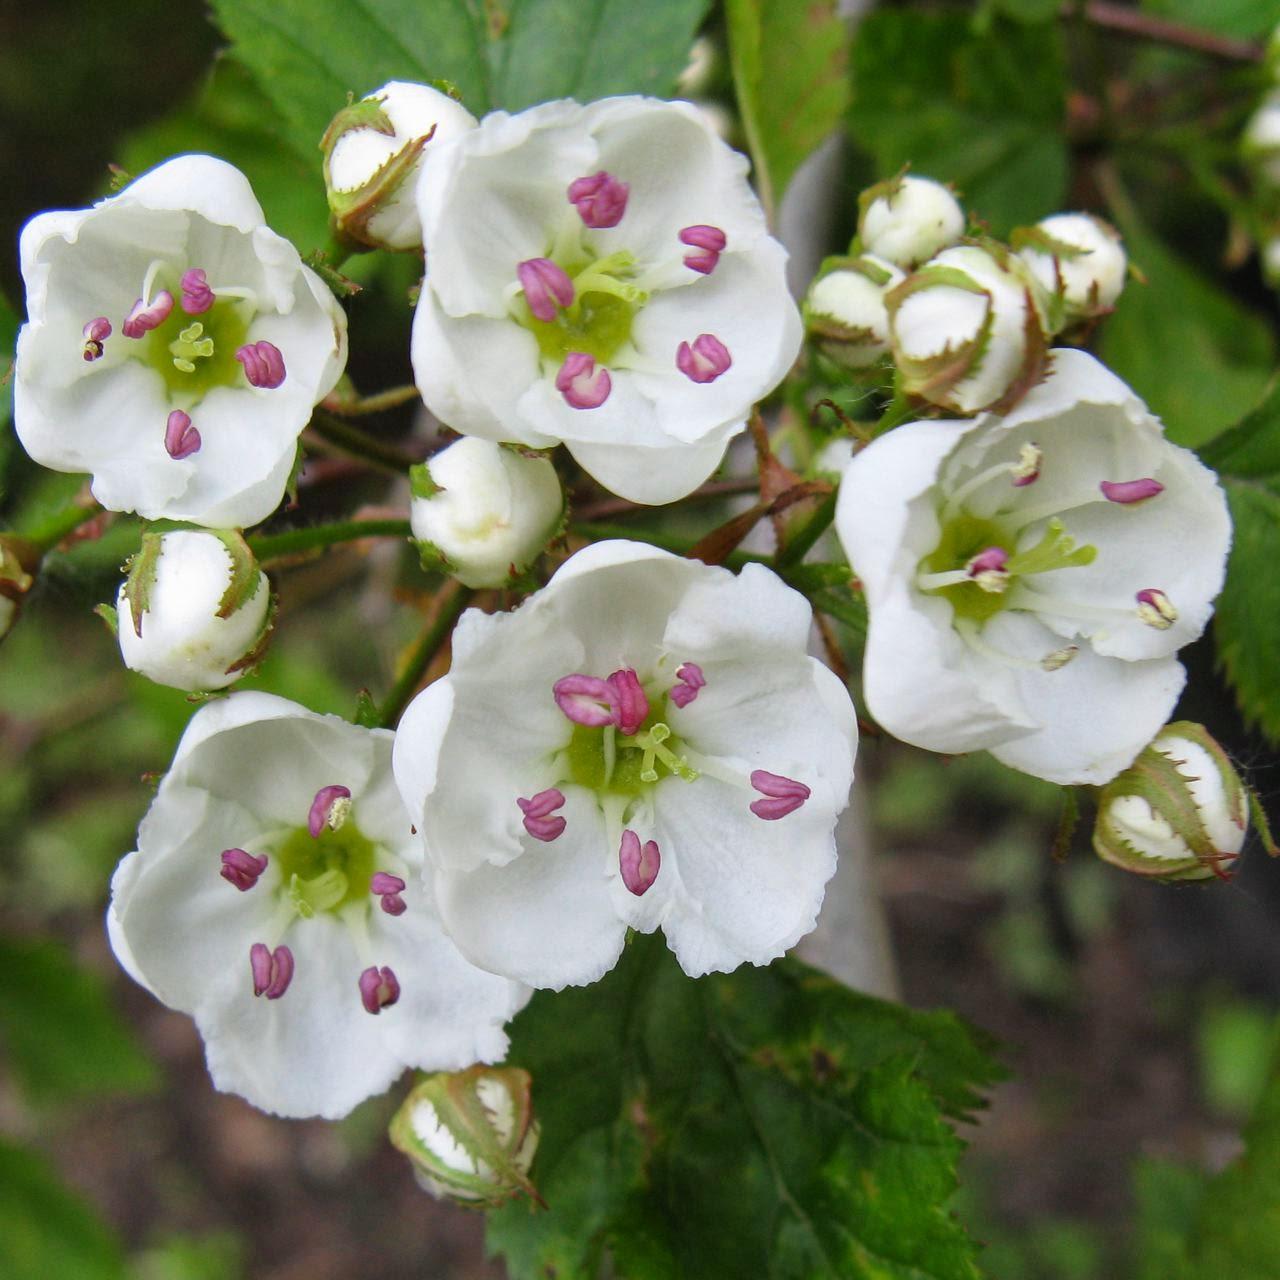 Moonflower Musings: The Spirit of Hawthorn: Healing the Heart